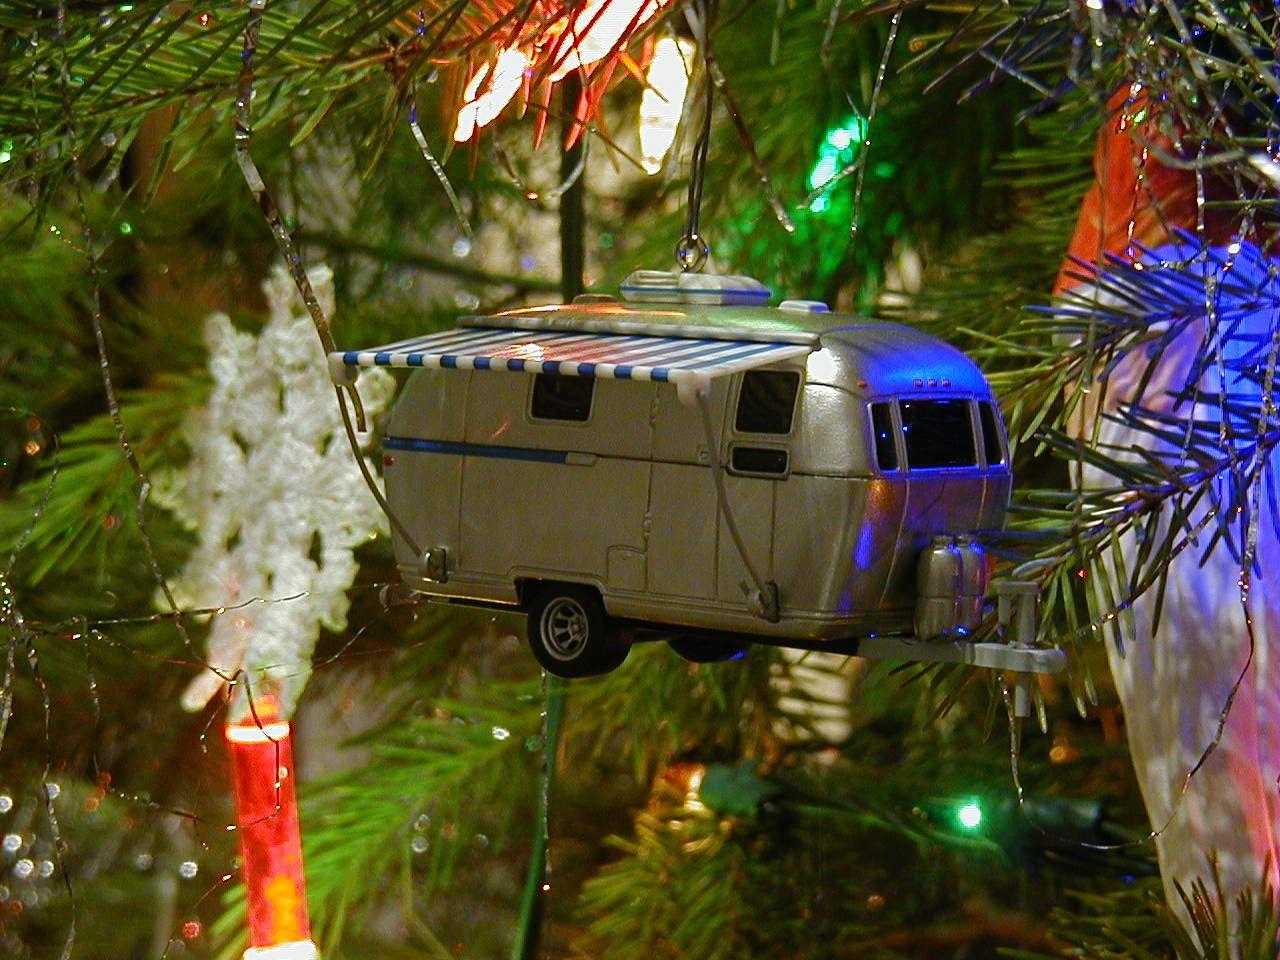 rv christmas ornaments - Google Search | Fun Town Christmas ...